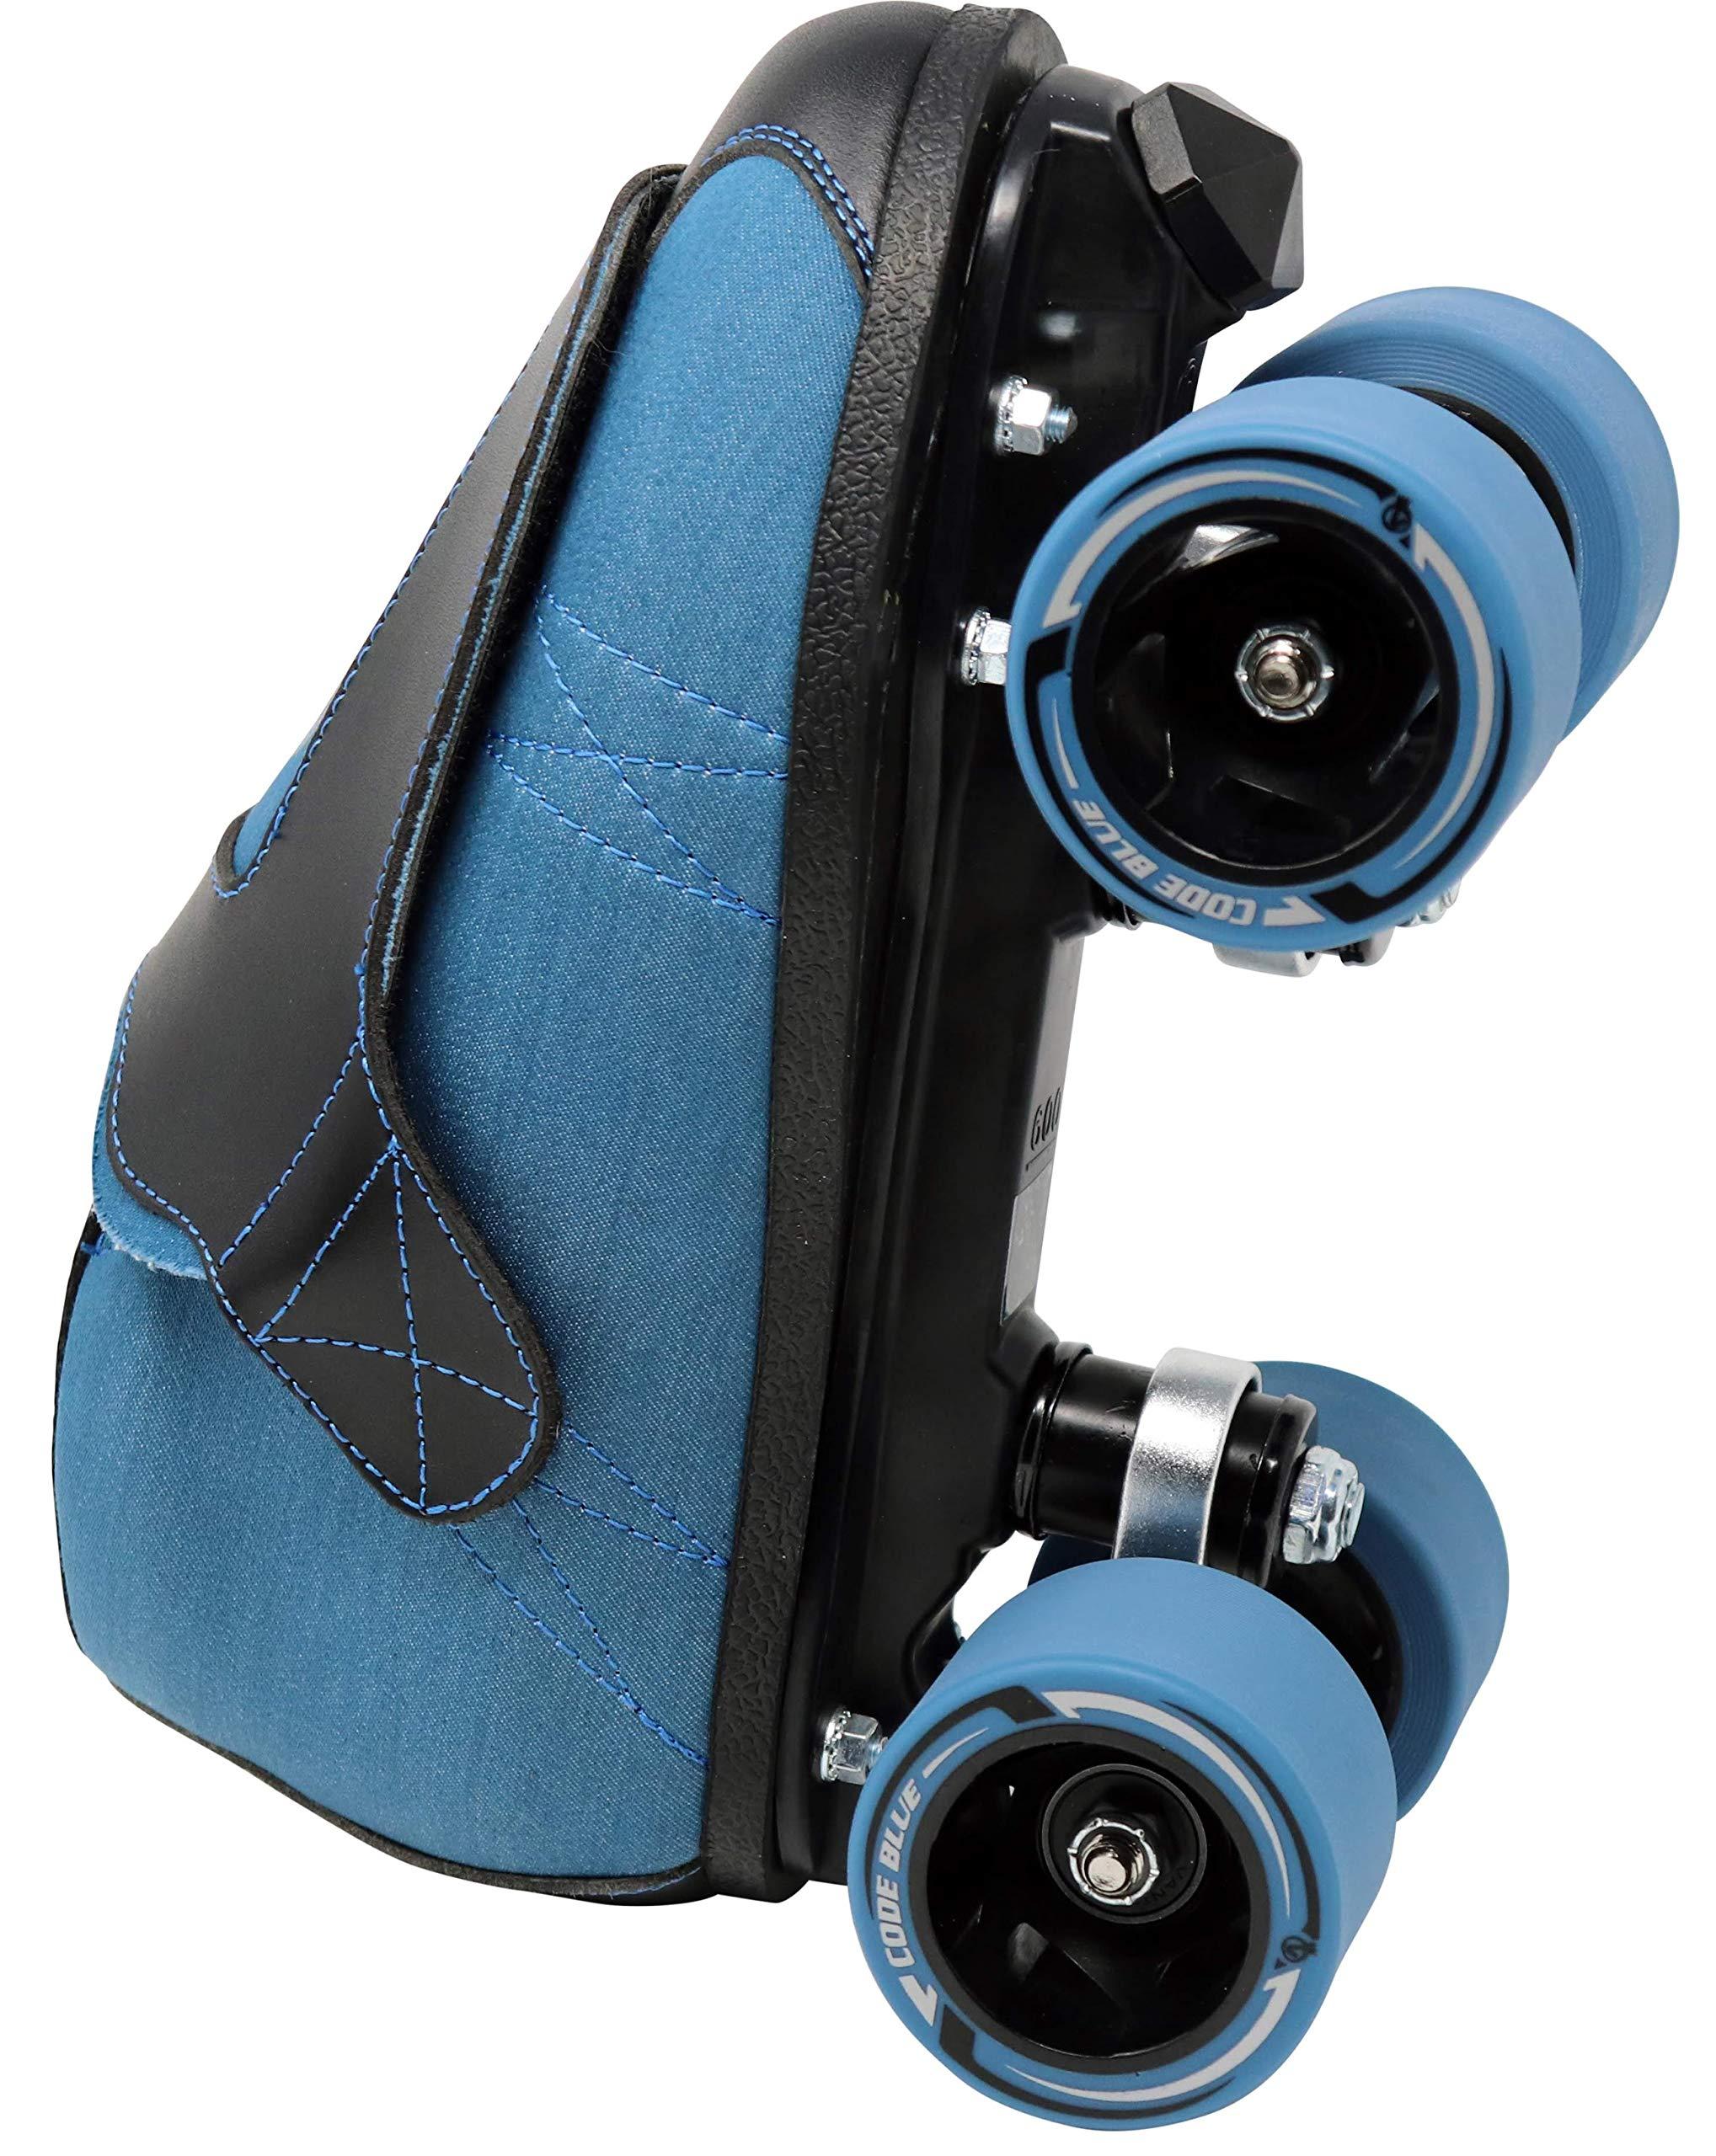 VNLA Code Blue Jam Skate - Mens & Womens Speed Skates - Quad Skates for Women & Men - Adjustable Roller Skate/Rollerskates - Outdoor & Indoor Adult Quad Skate - Kid/Kids Roller Skates (Size 3) by VNLA (Image #5)